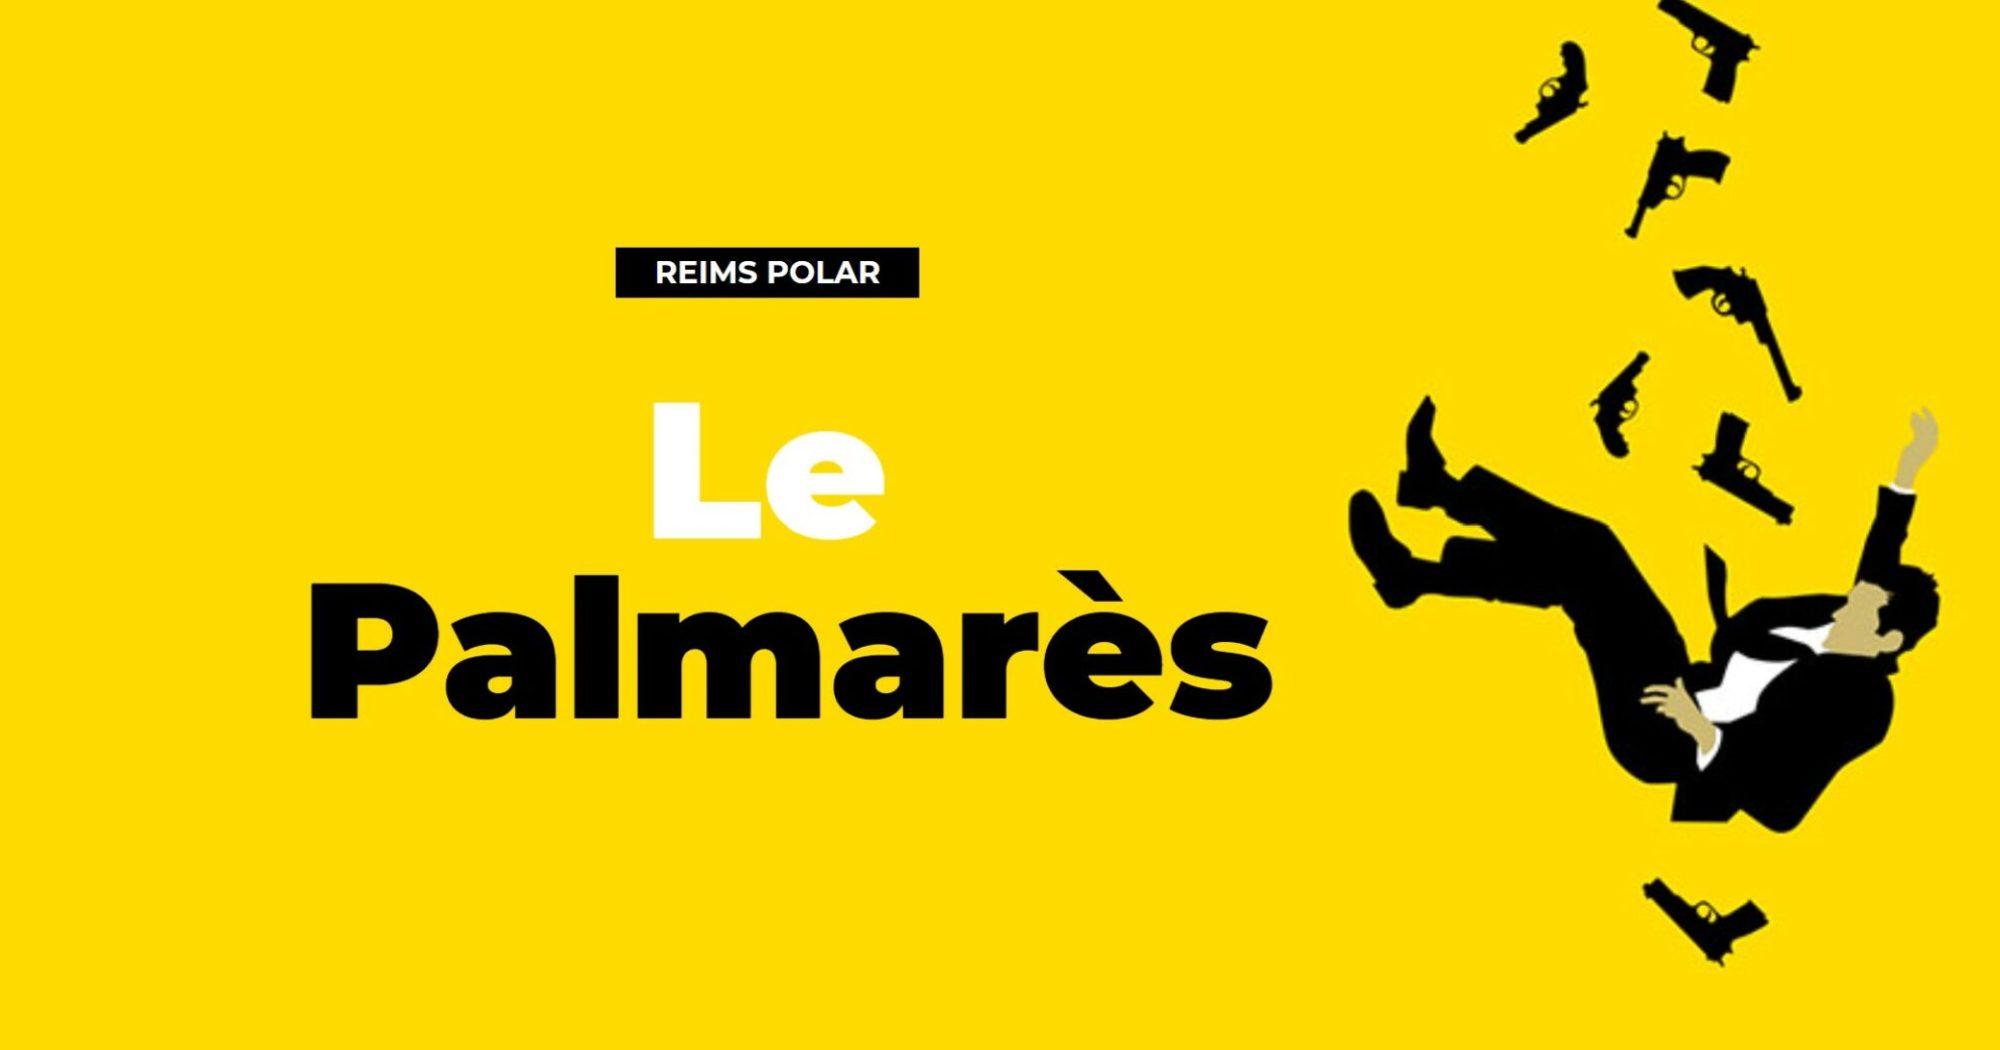 Reims Polar 38e édition du film policier 2021, palmares